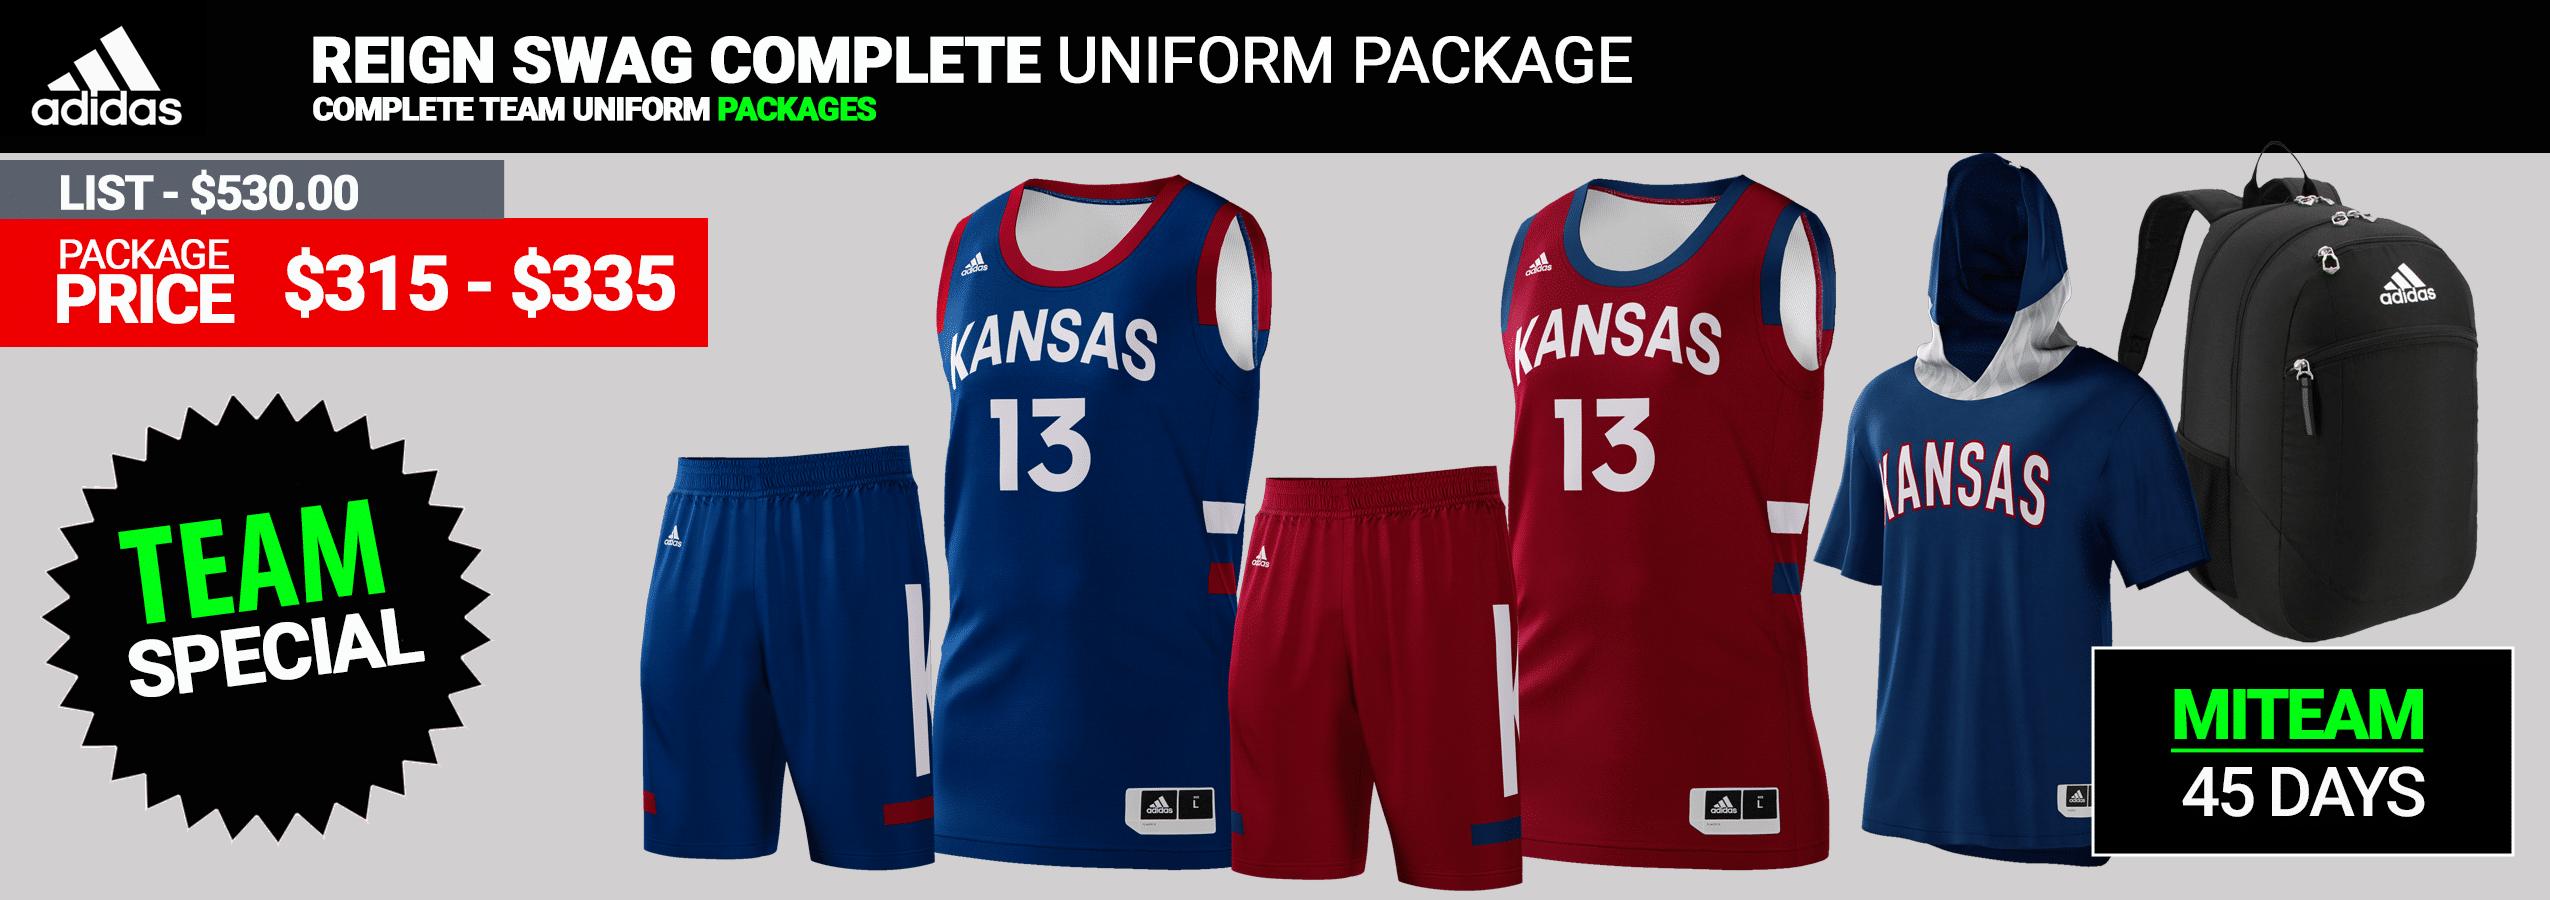 Adidas Custom Reversible Youth Basketball Uniform Package